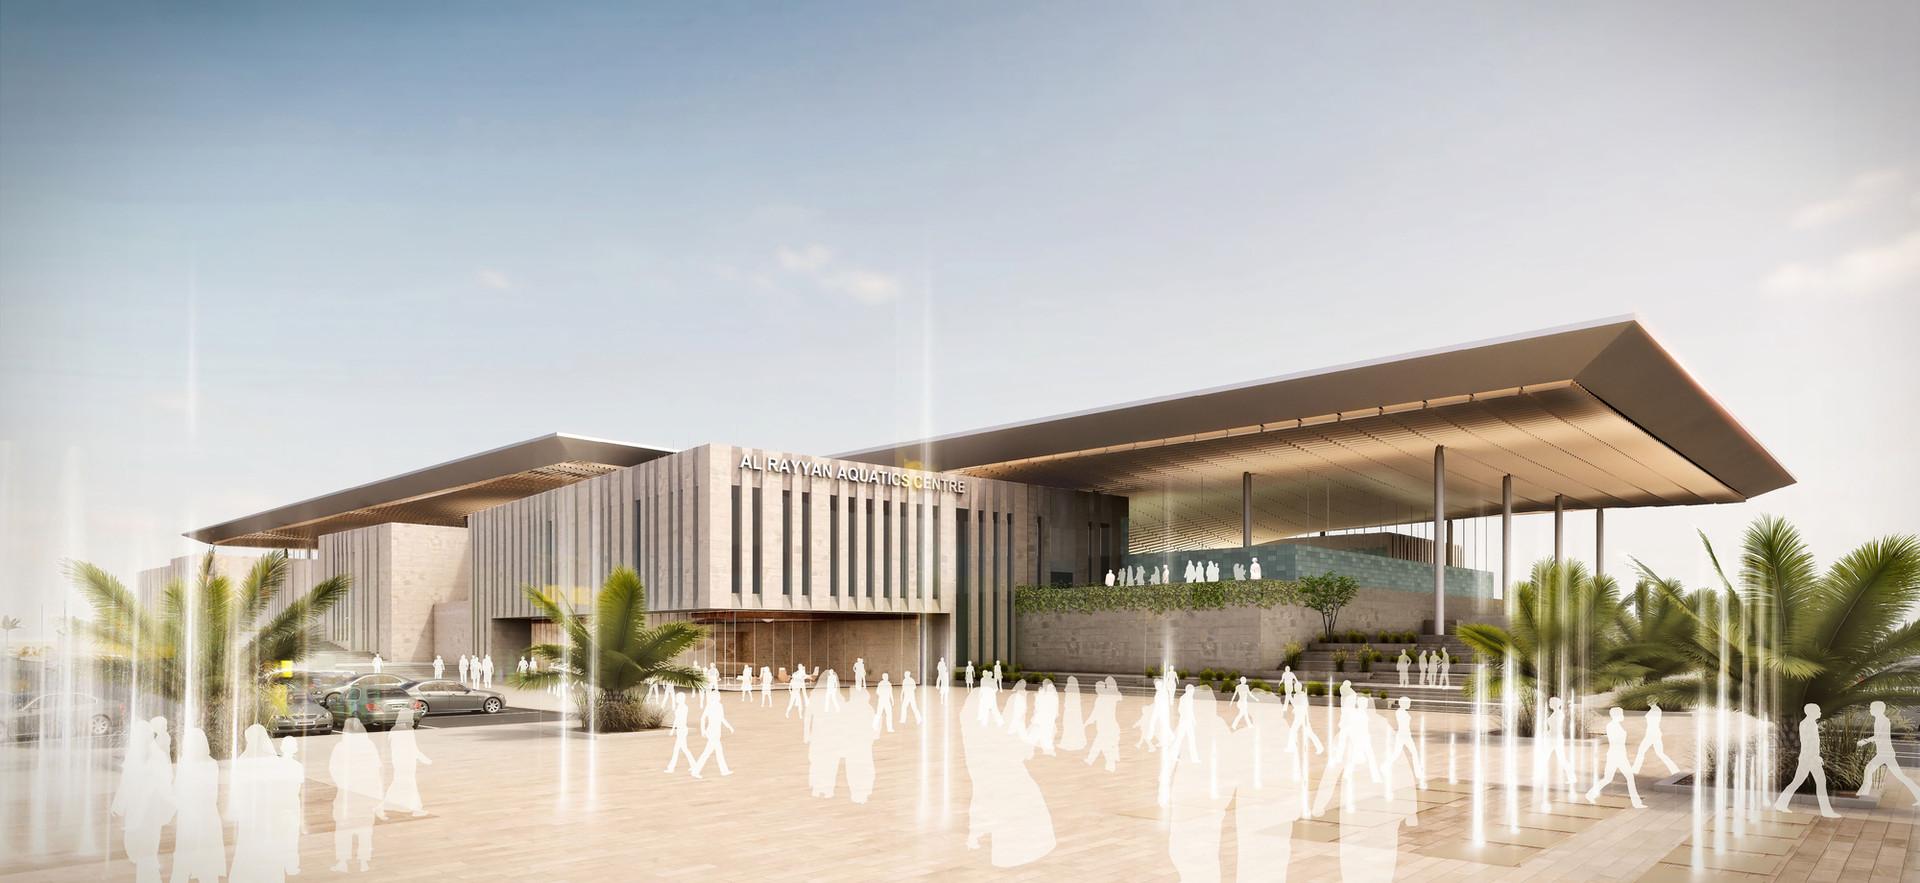 QOC Aquatic Center, Qatar